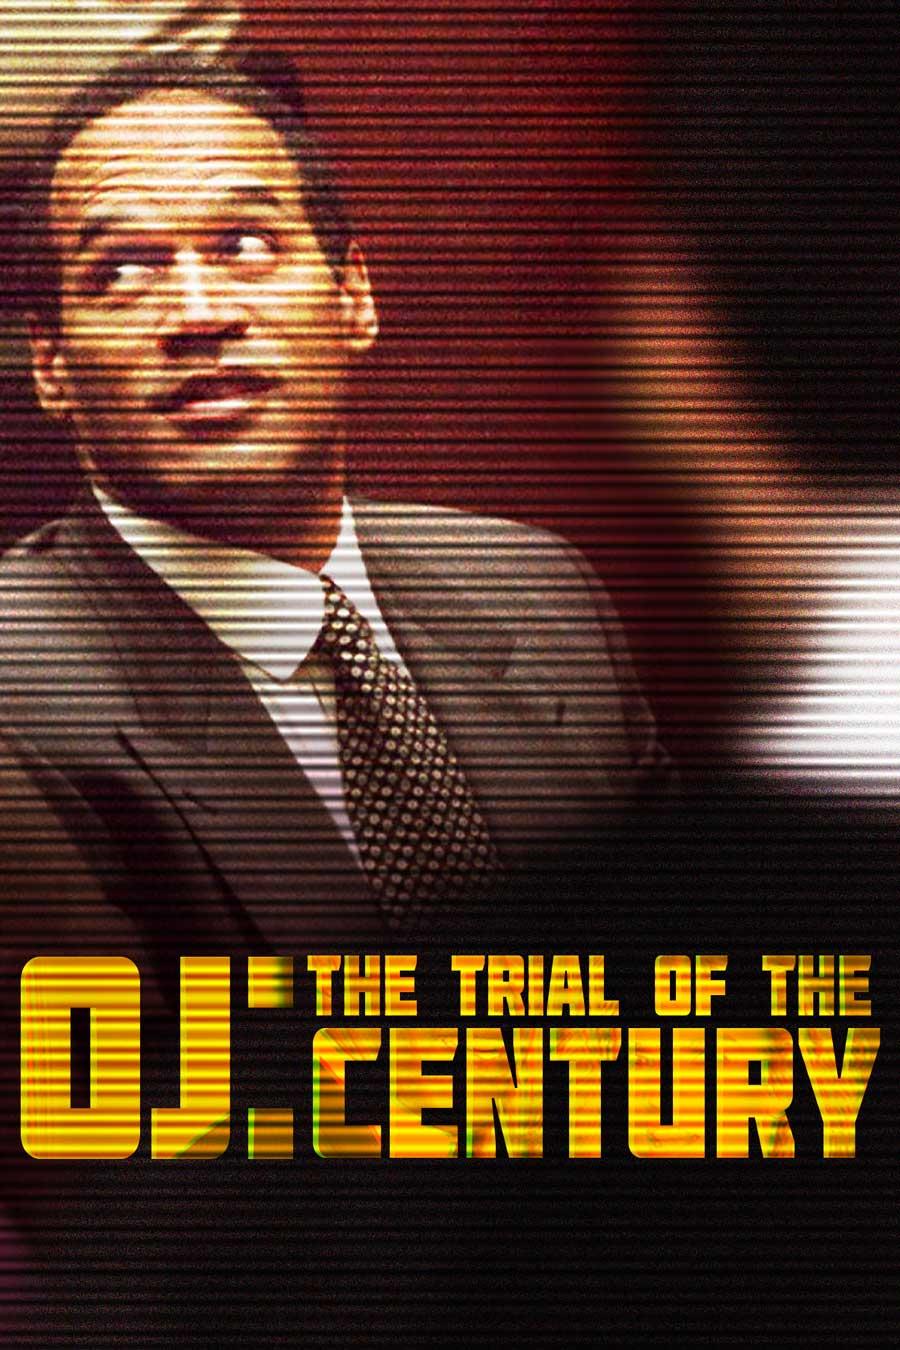 OJ: Trial of the Century